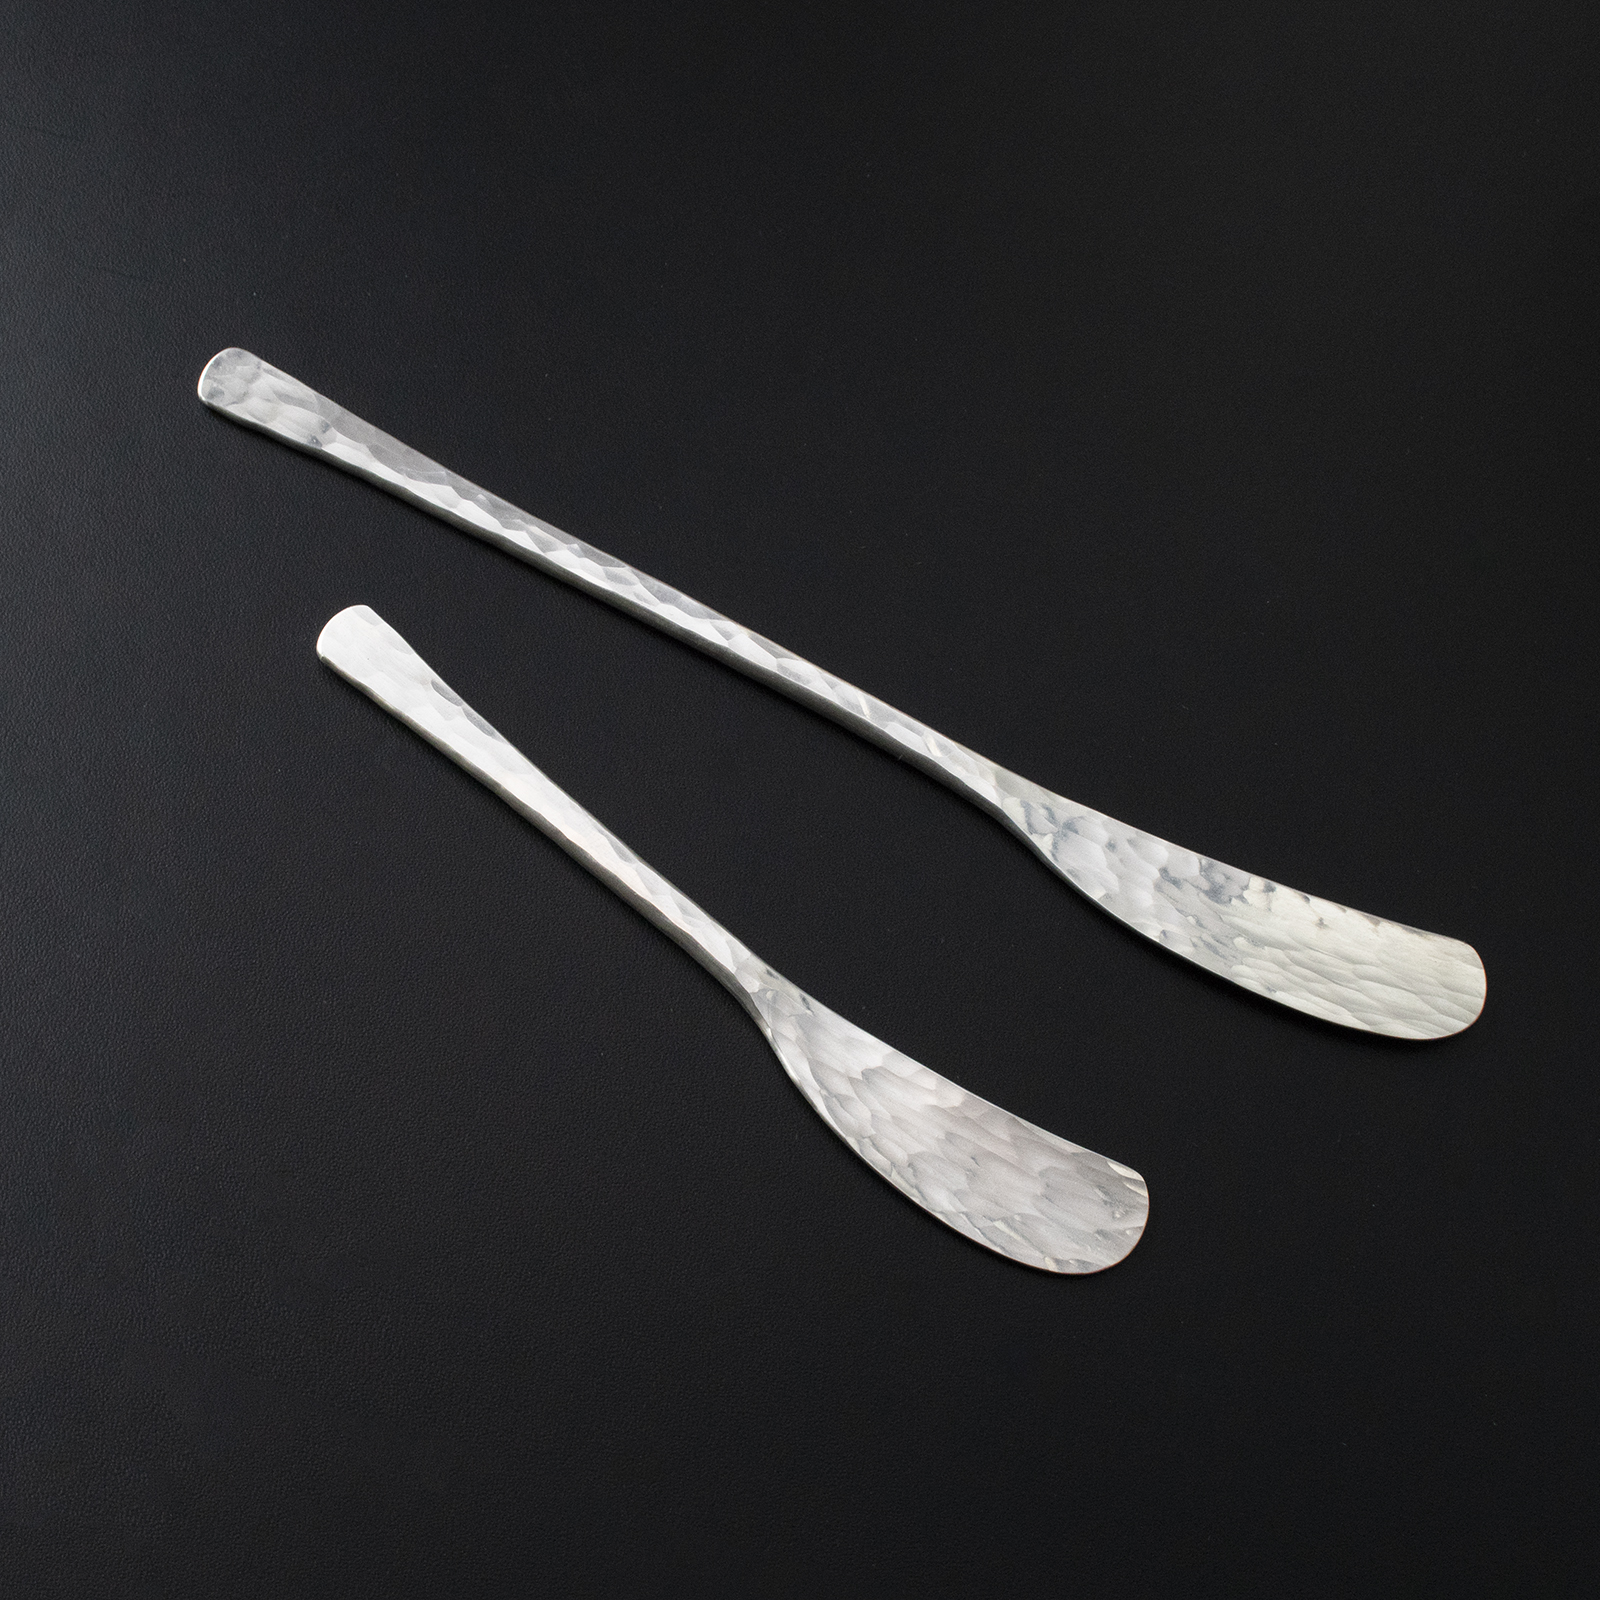 Sterling Silver Jam Knives